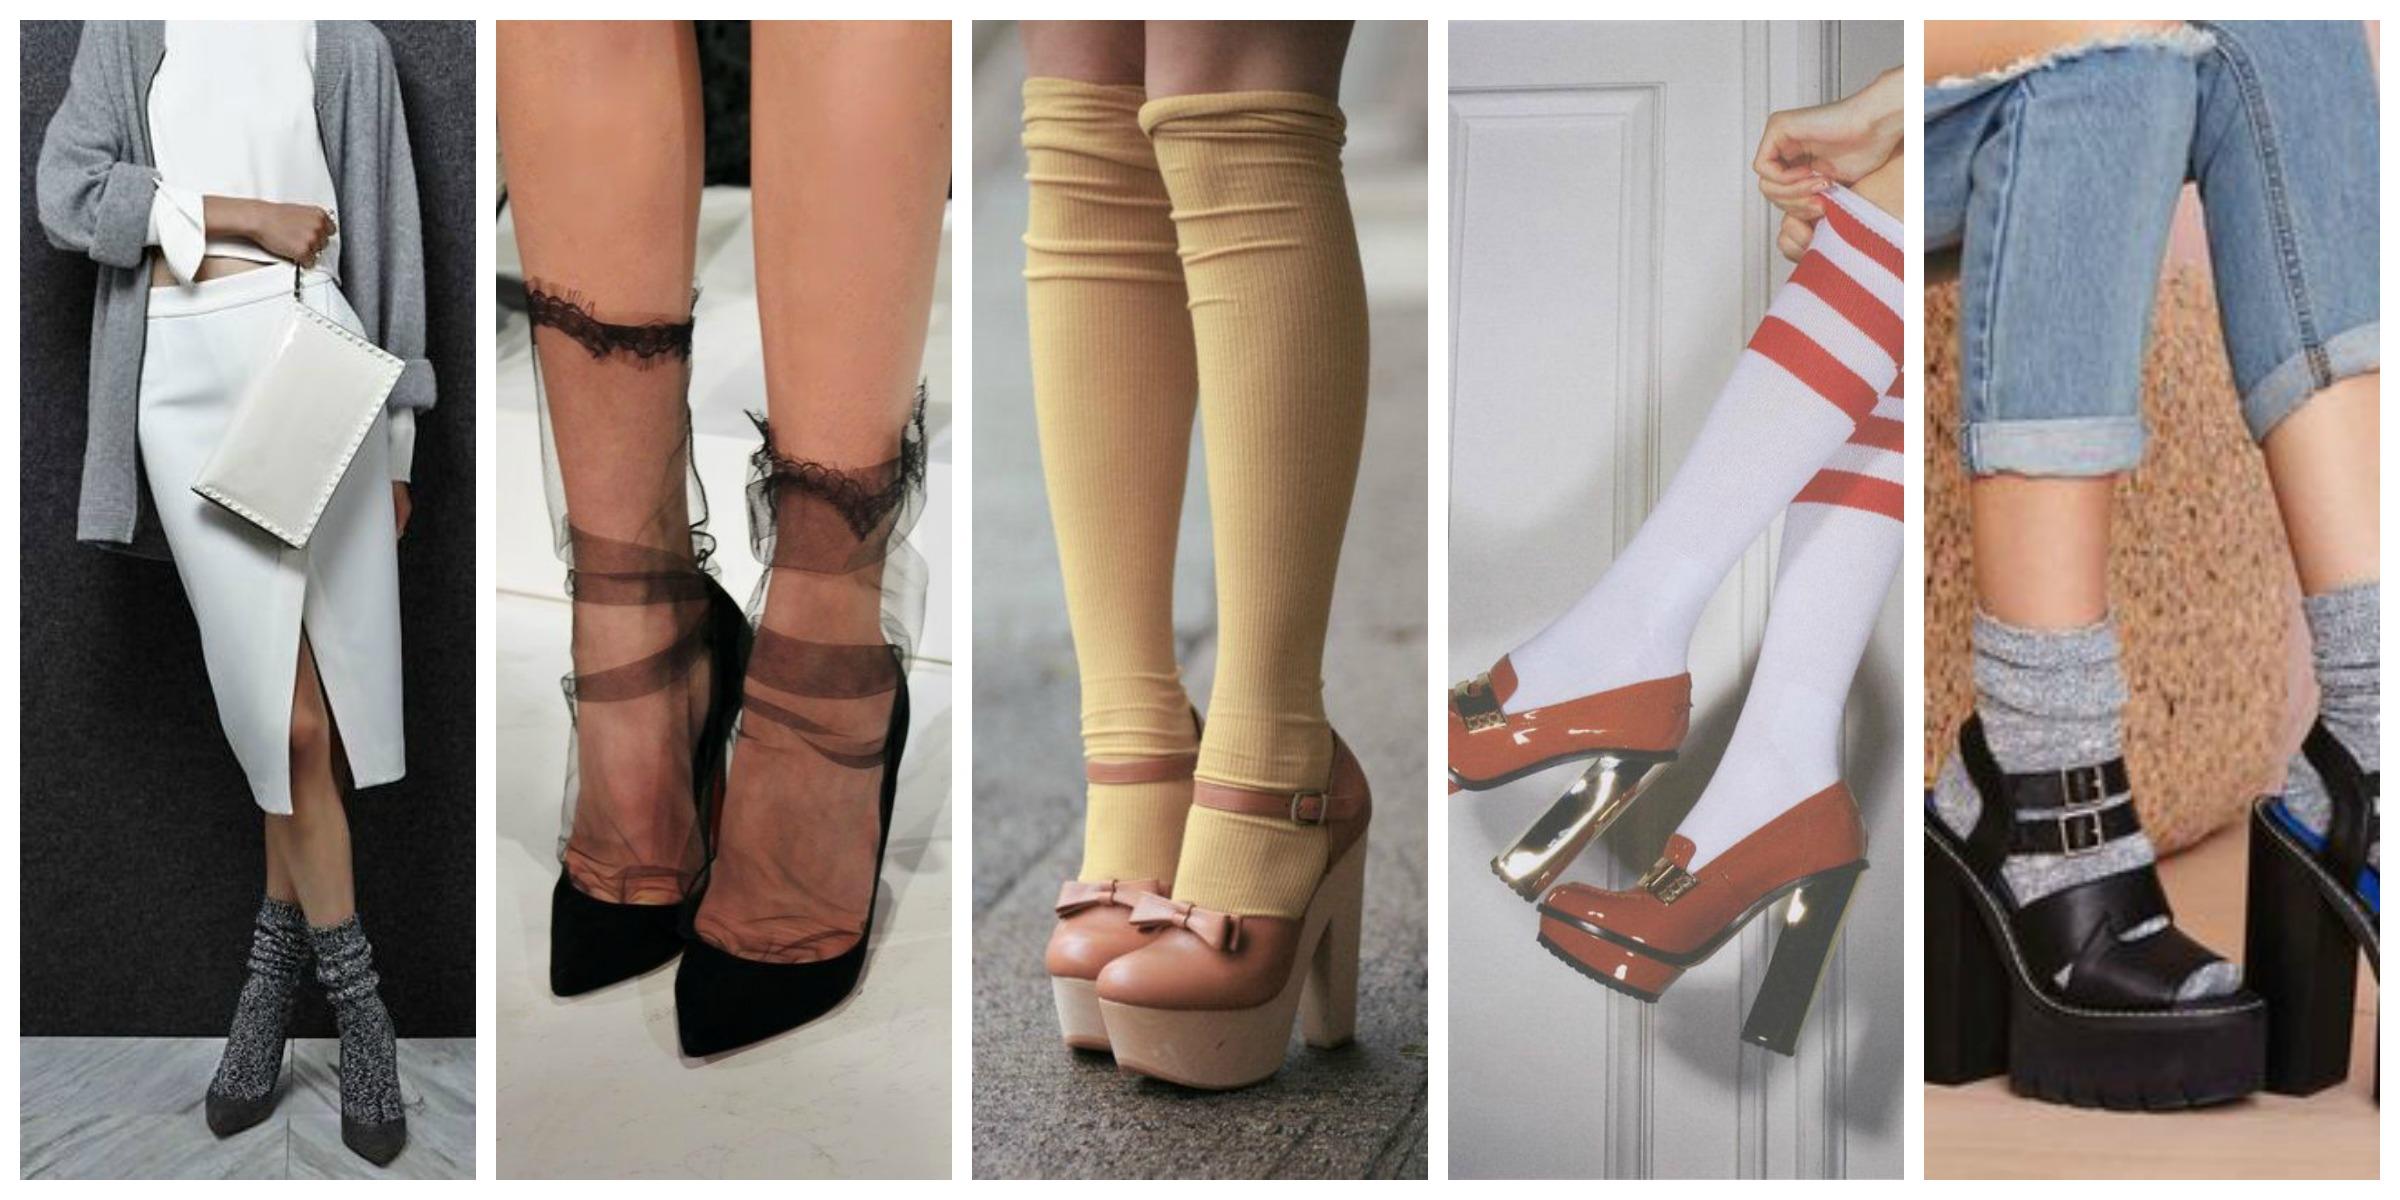 socks-and-heels-1